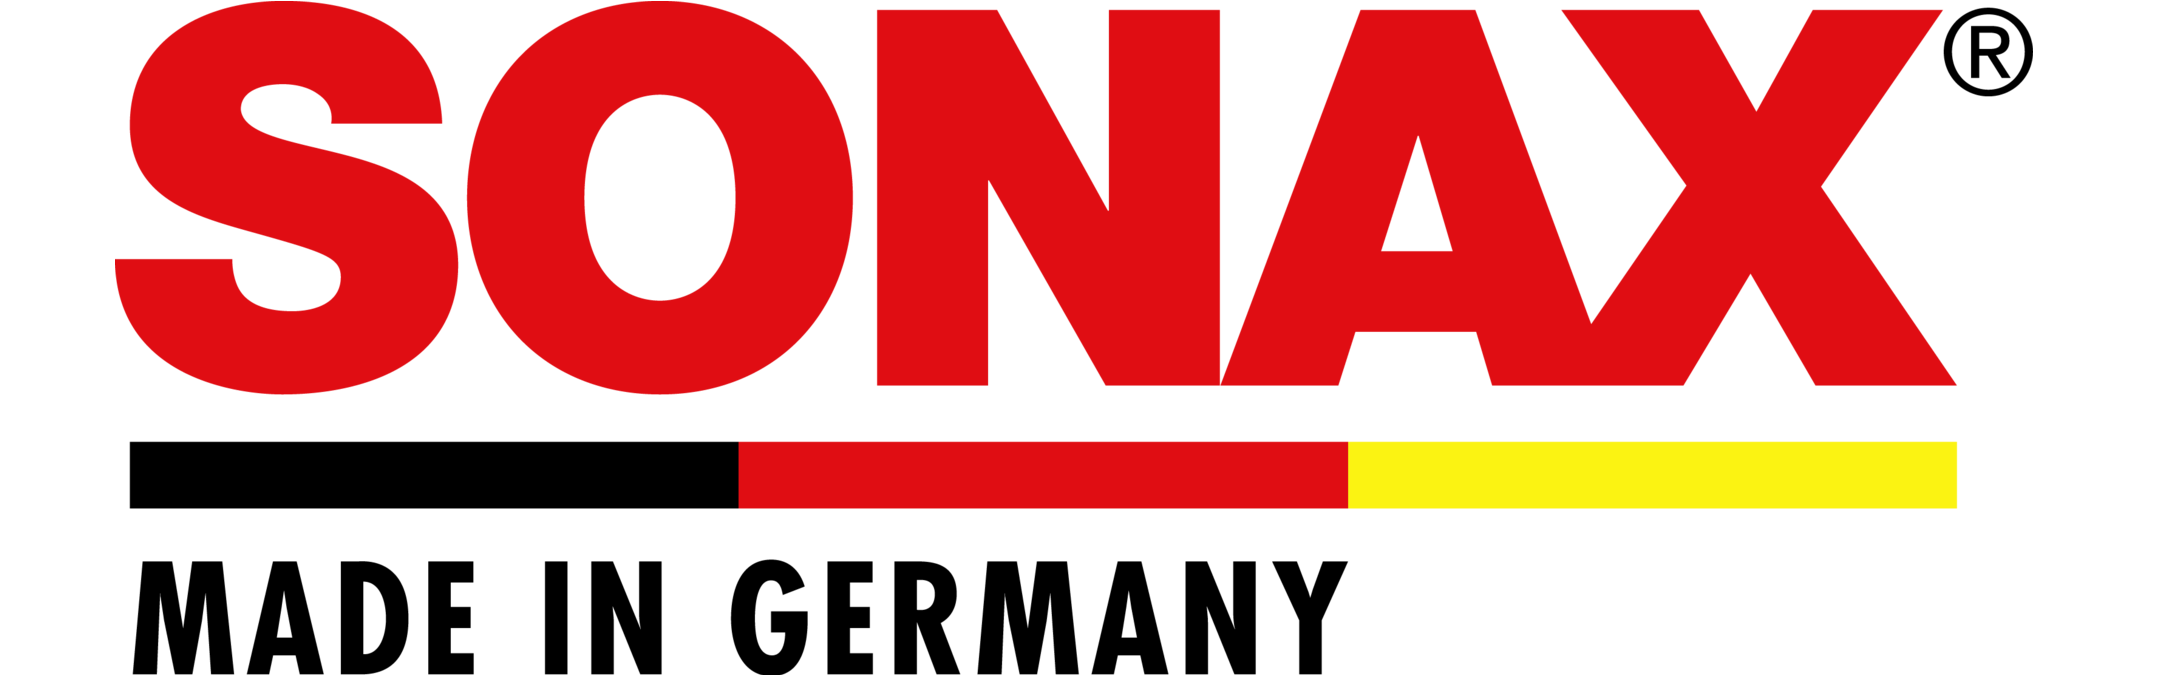 SONAX-Logo-for-heureka